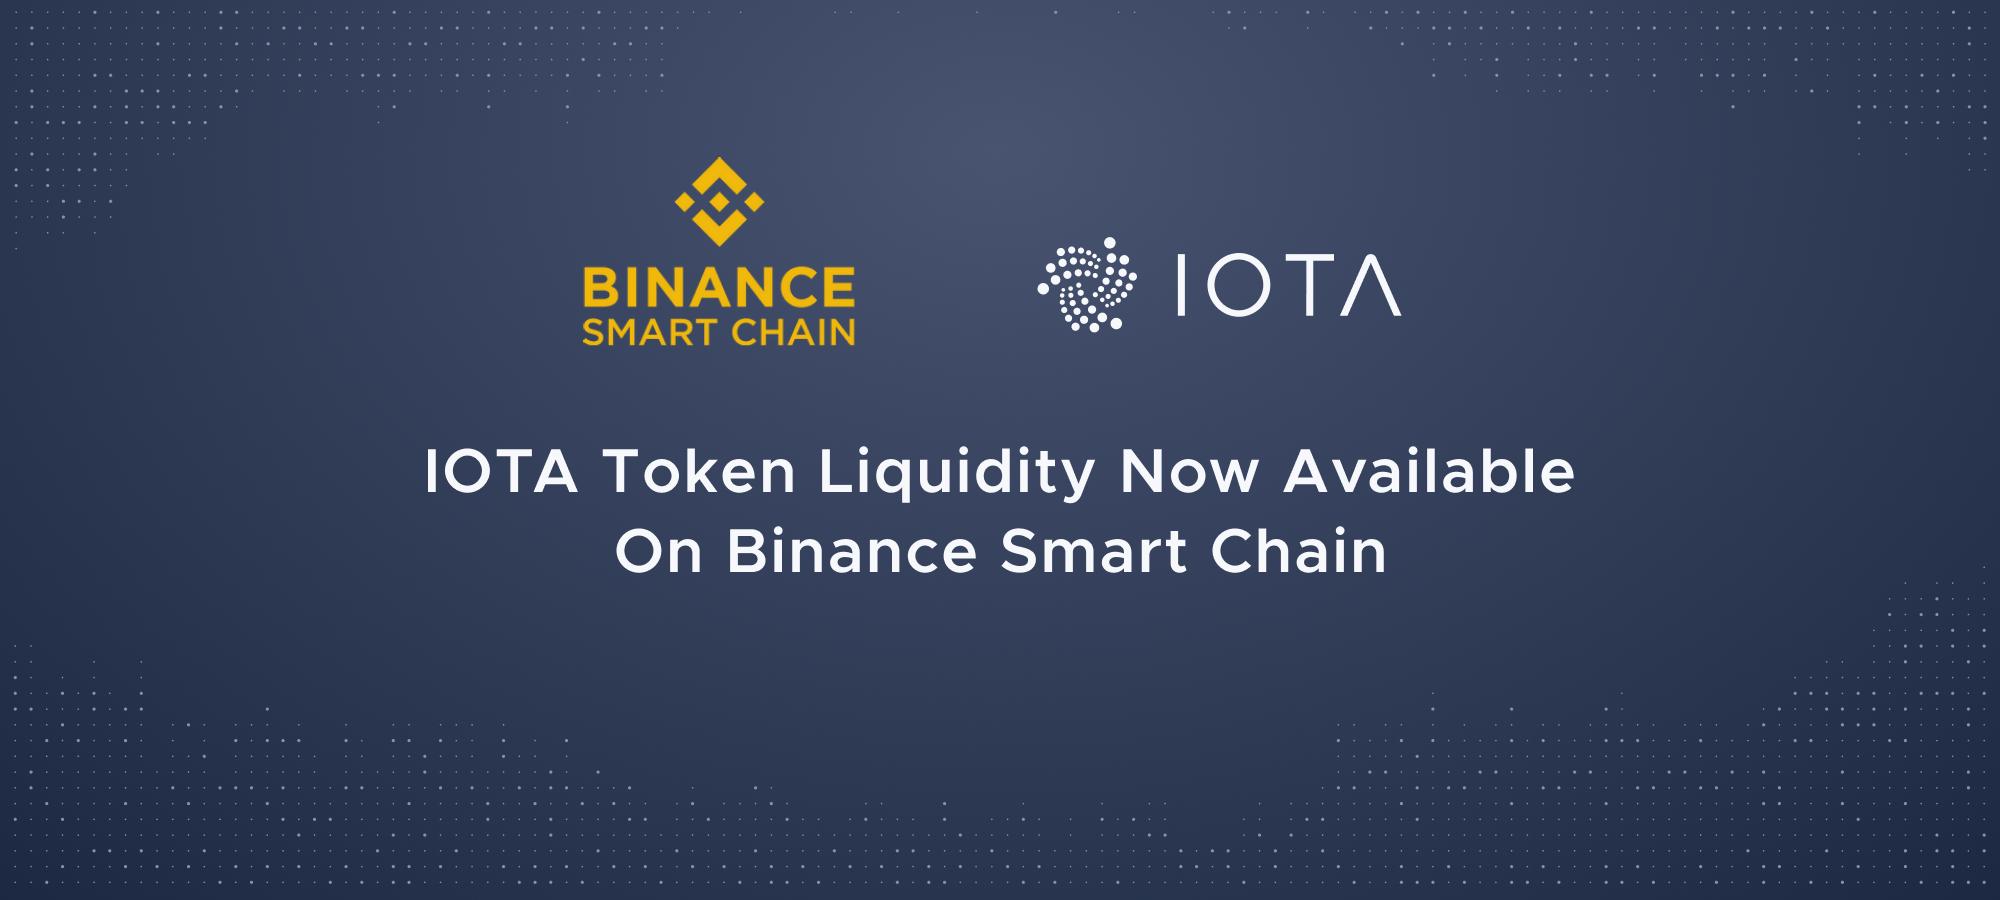 IOTA Token Liquidity Now Available On Binance Smart Chain